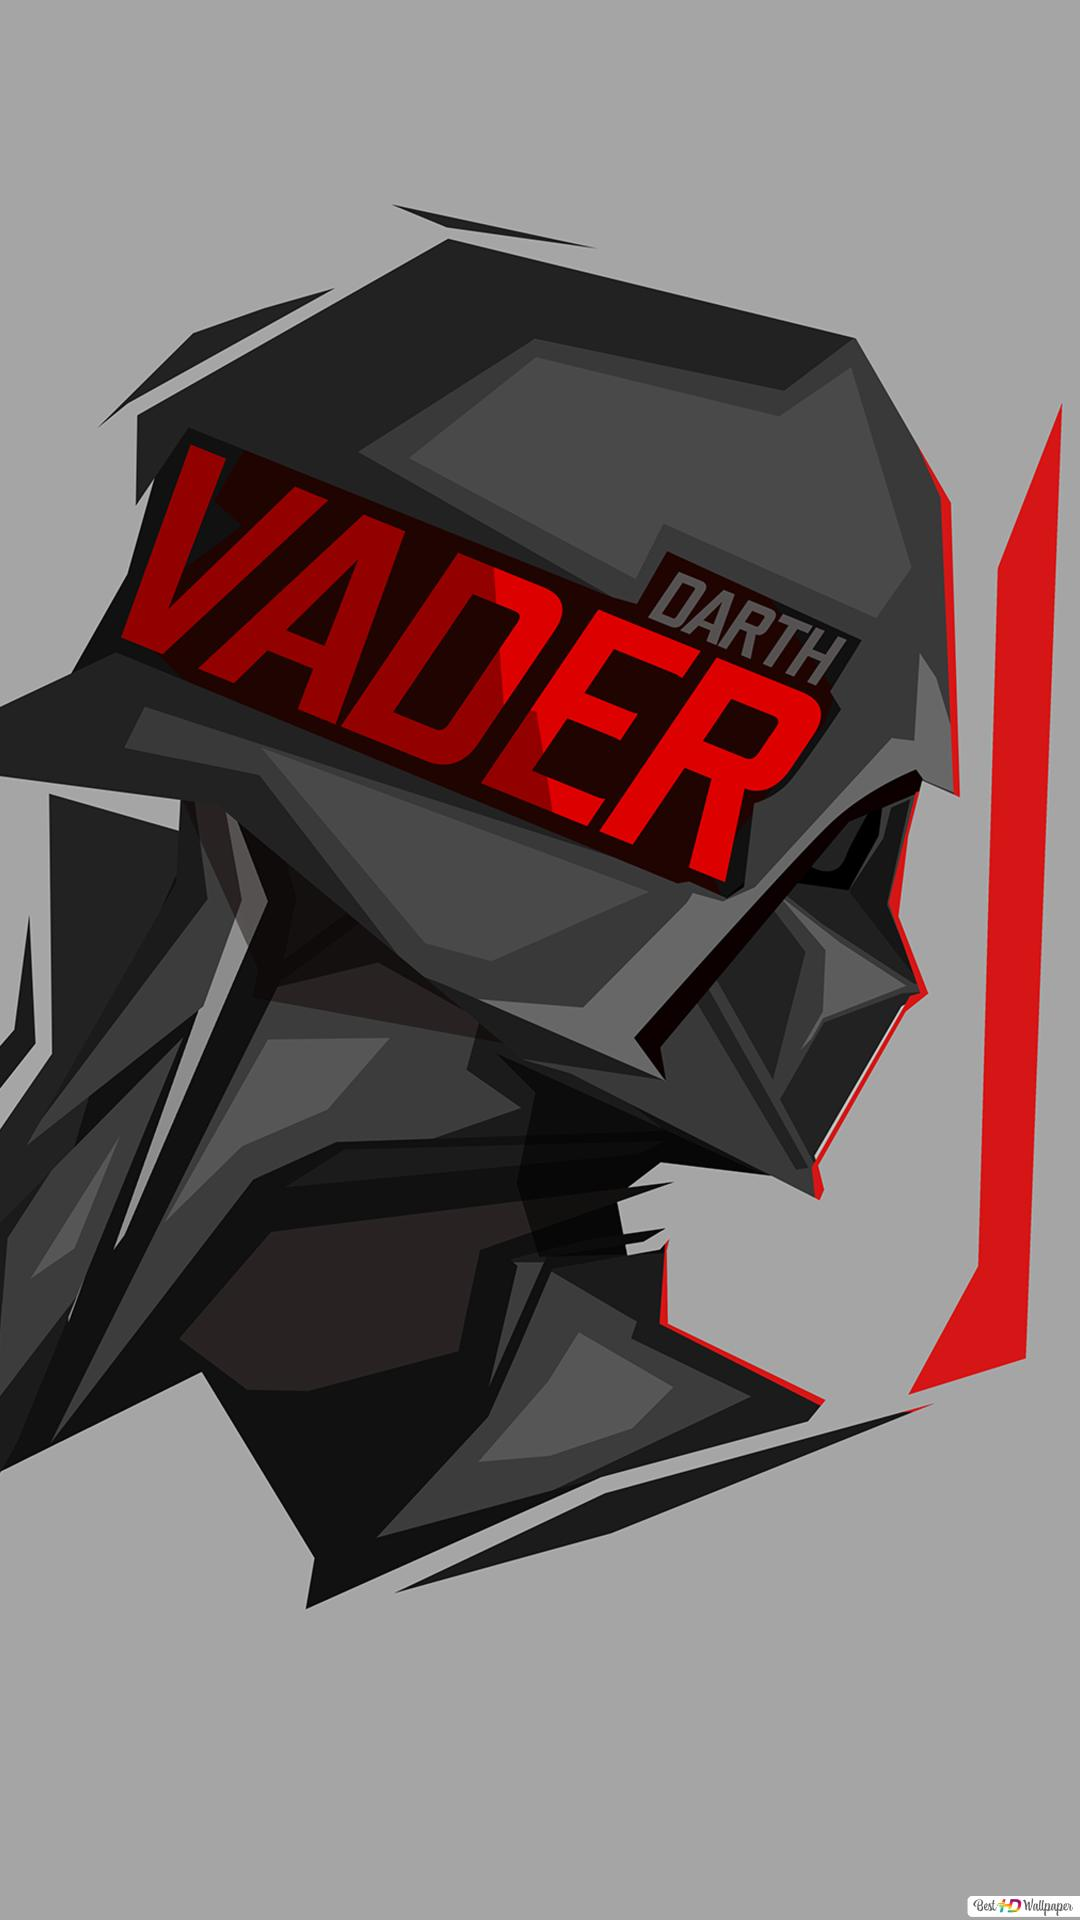 Star Wars Darth Vader Minimalist In Gray Wallpaper Background Hd Wallpaper Download